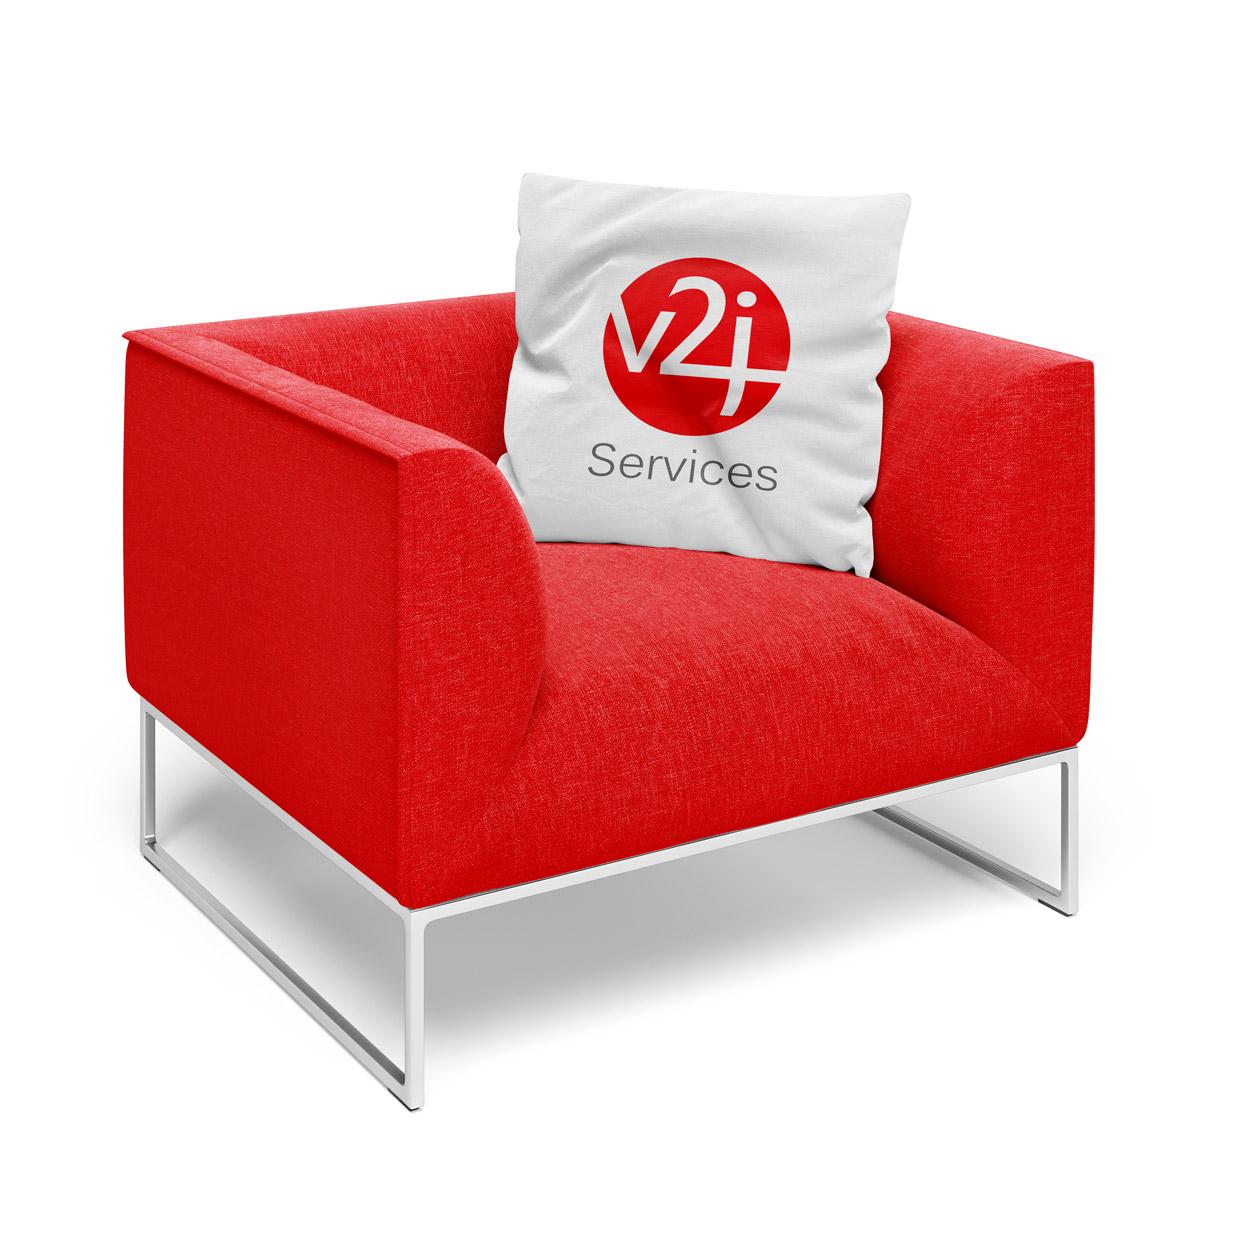 logo design v2j services 04